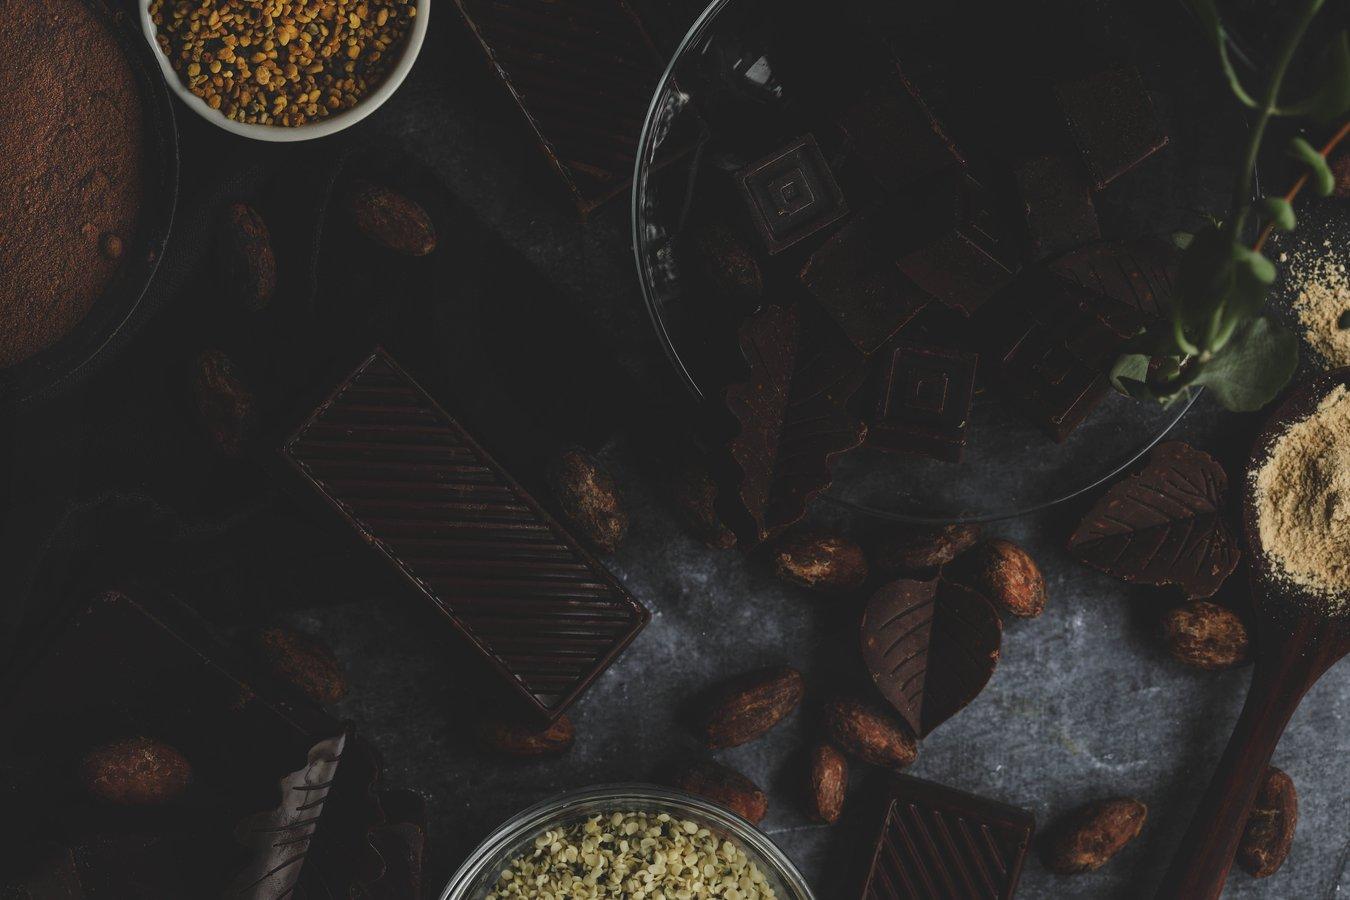 Chocolate bars with hemp seeds, bee pollen and maca powder